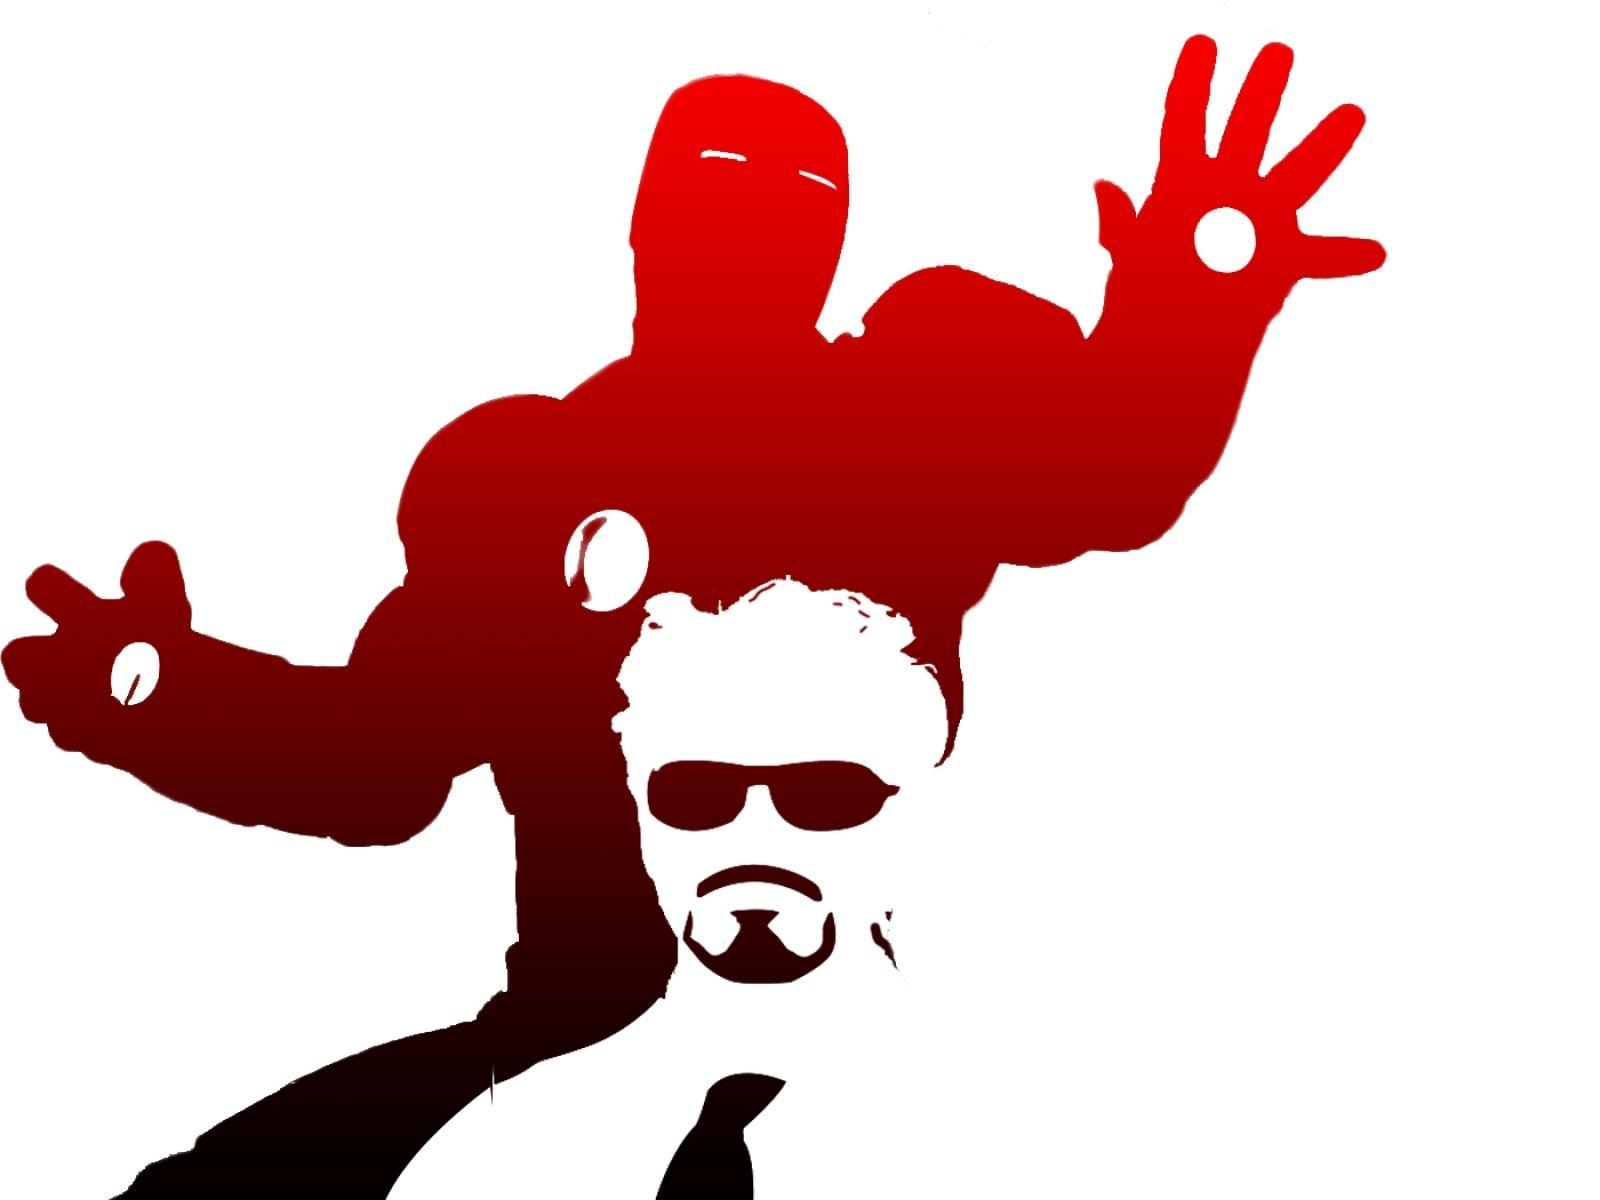 Game Of Thrones Quotes Desktop Wallpaper The Avengers Silhouette Iron Man Silhouette Tony Stark